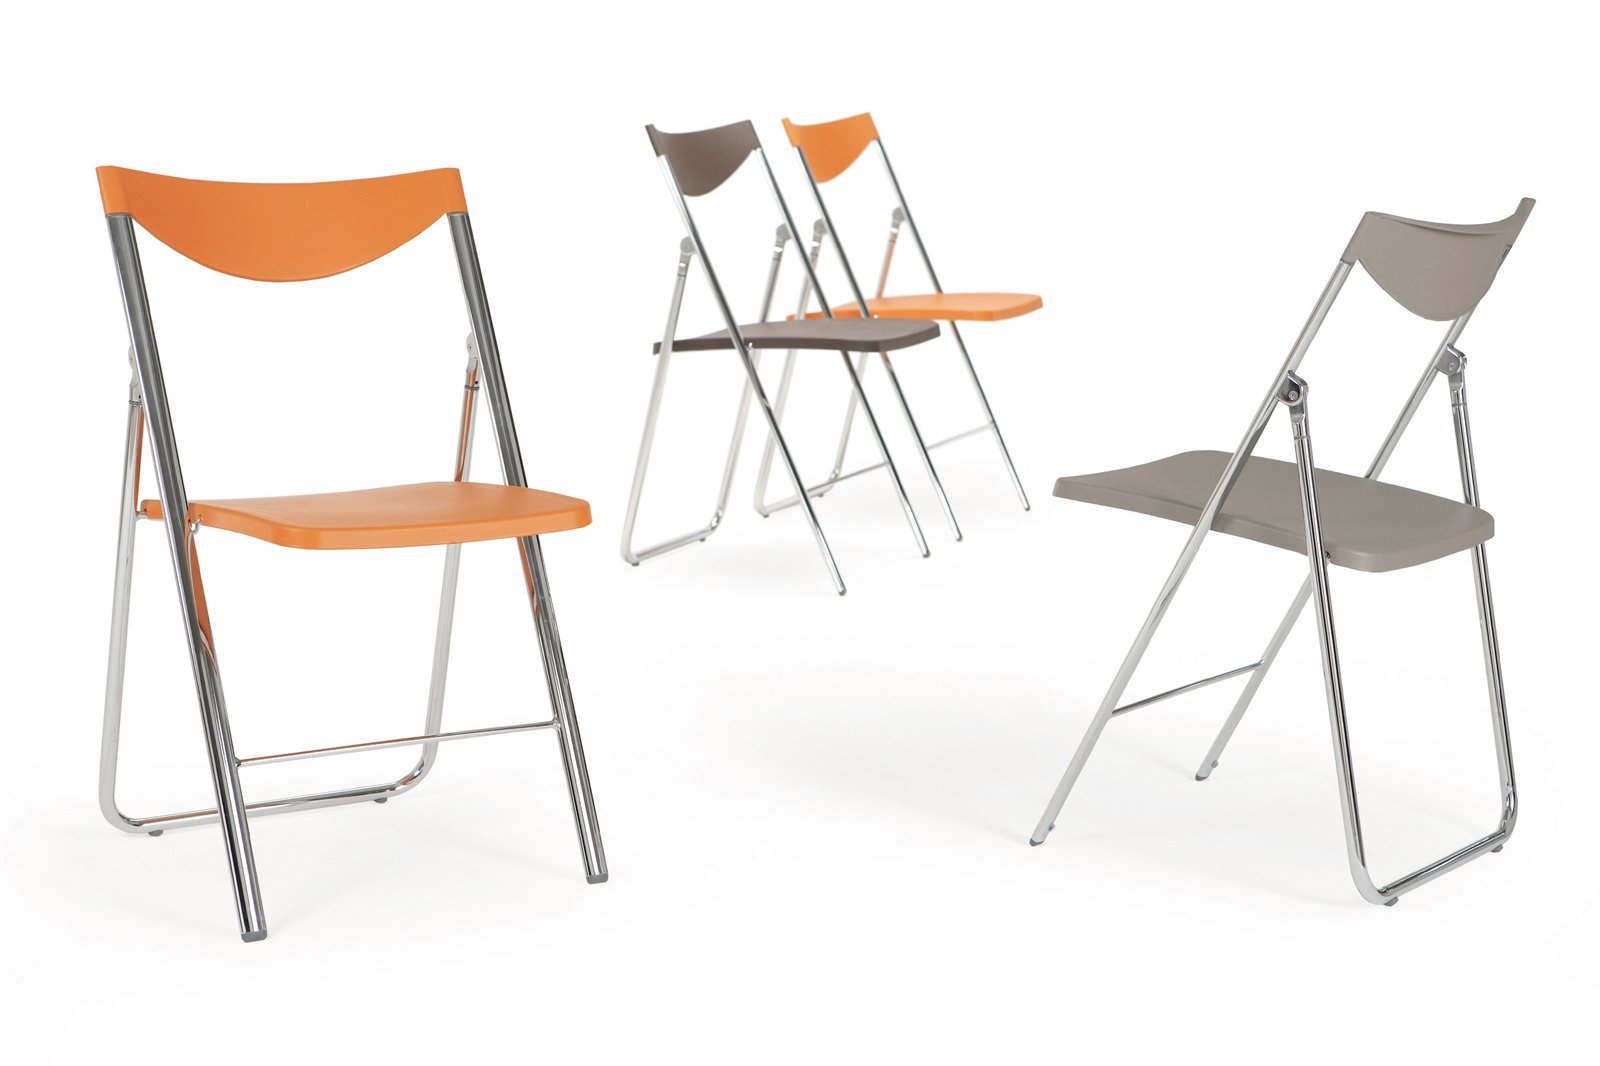 Posti O Il Pratico Gancio Da Parete Per 4 Sedie. Www.ozzio.com #B1551A 1600 1066 Sedie Cucina IKEA